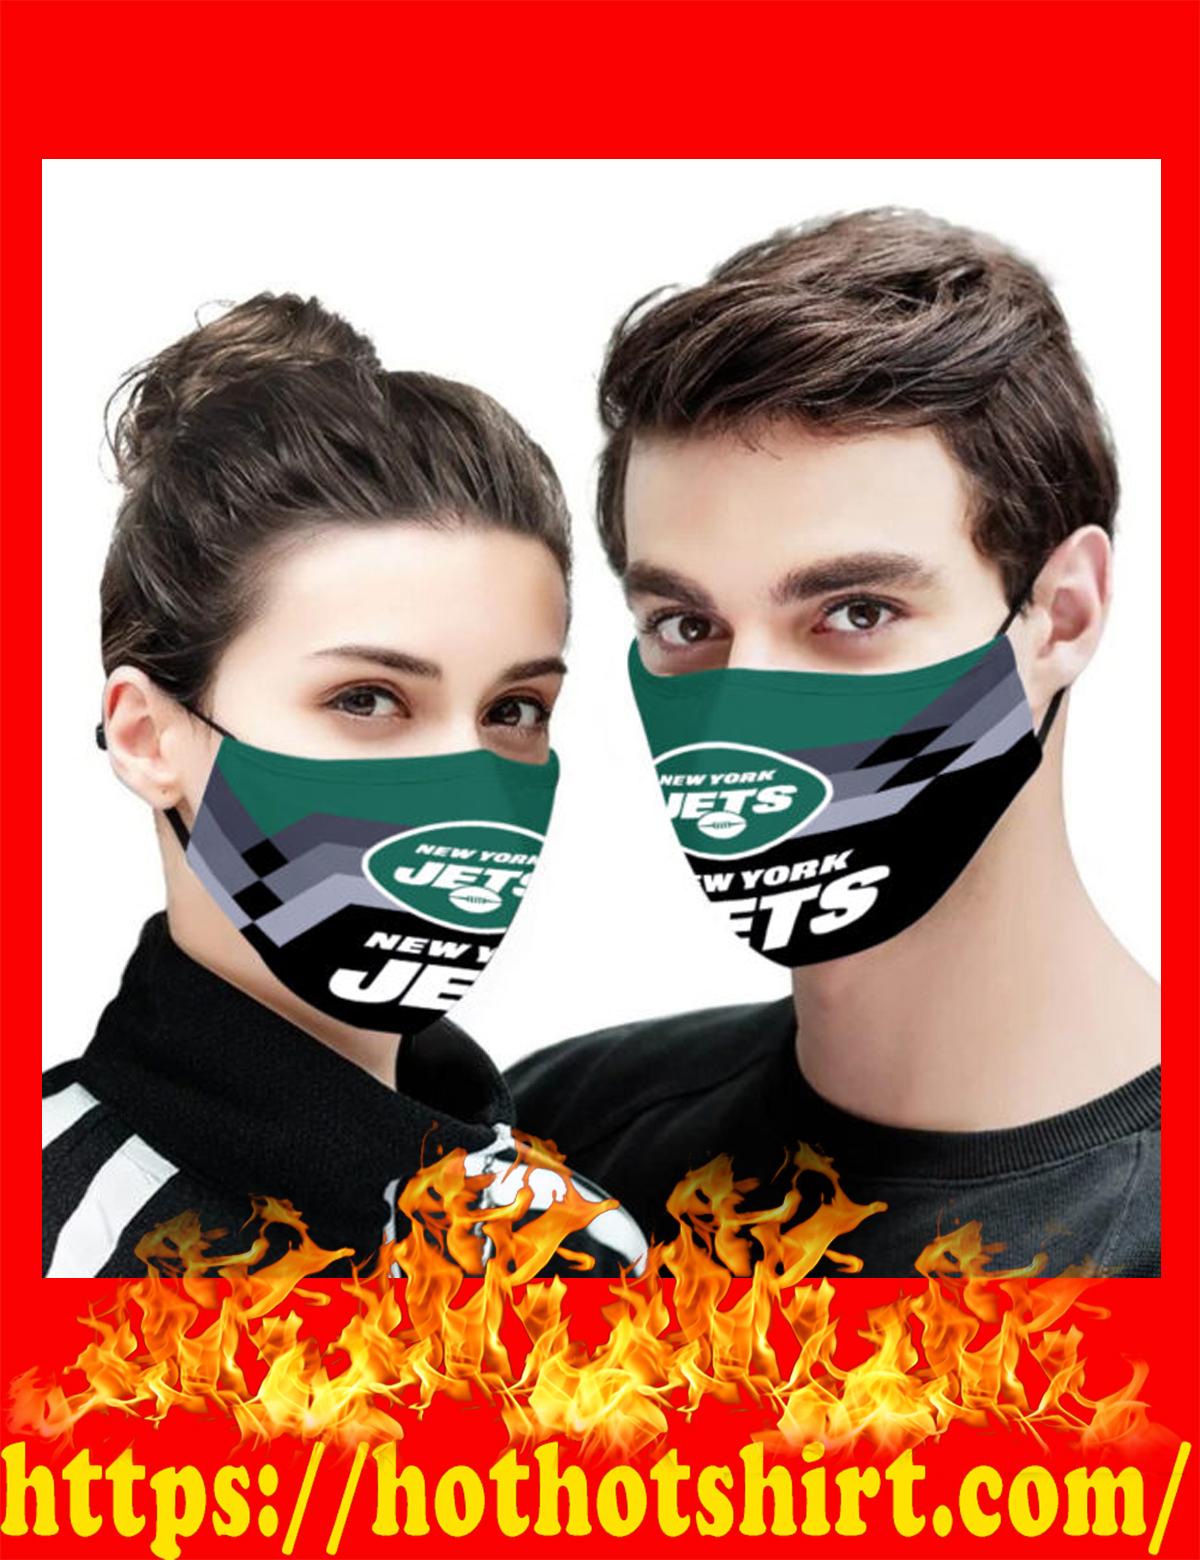 New york jets face mask - detail